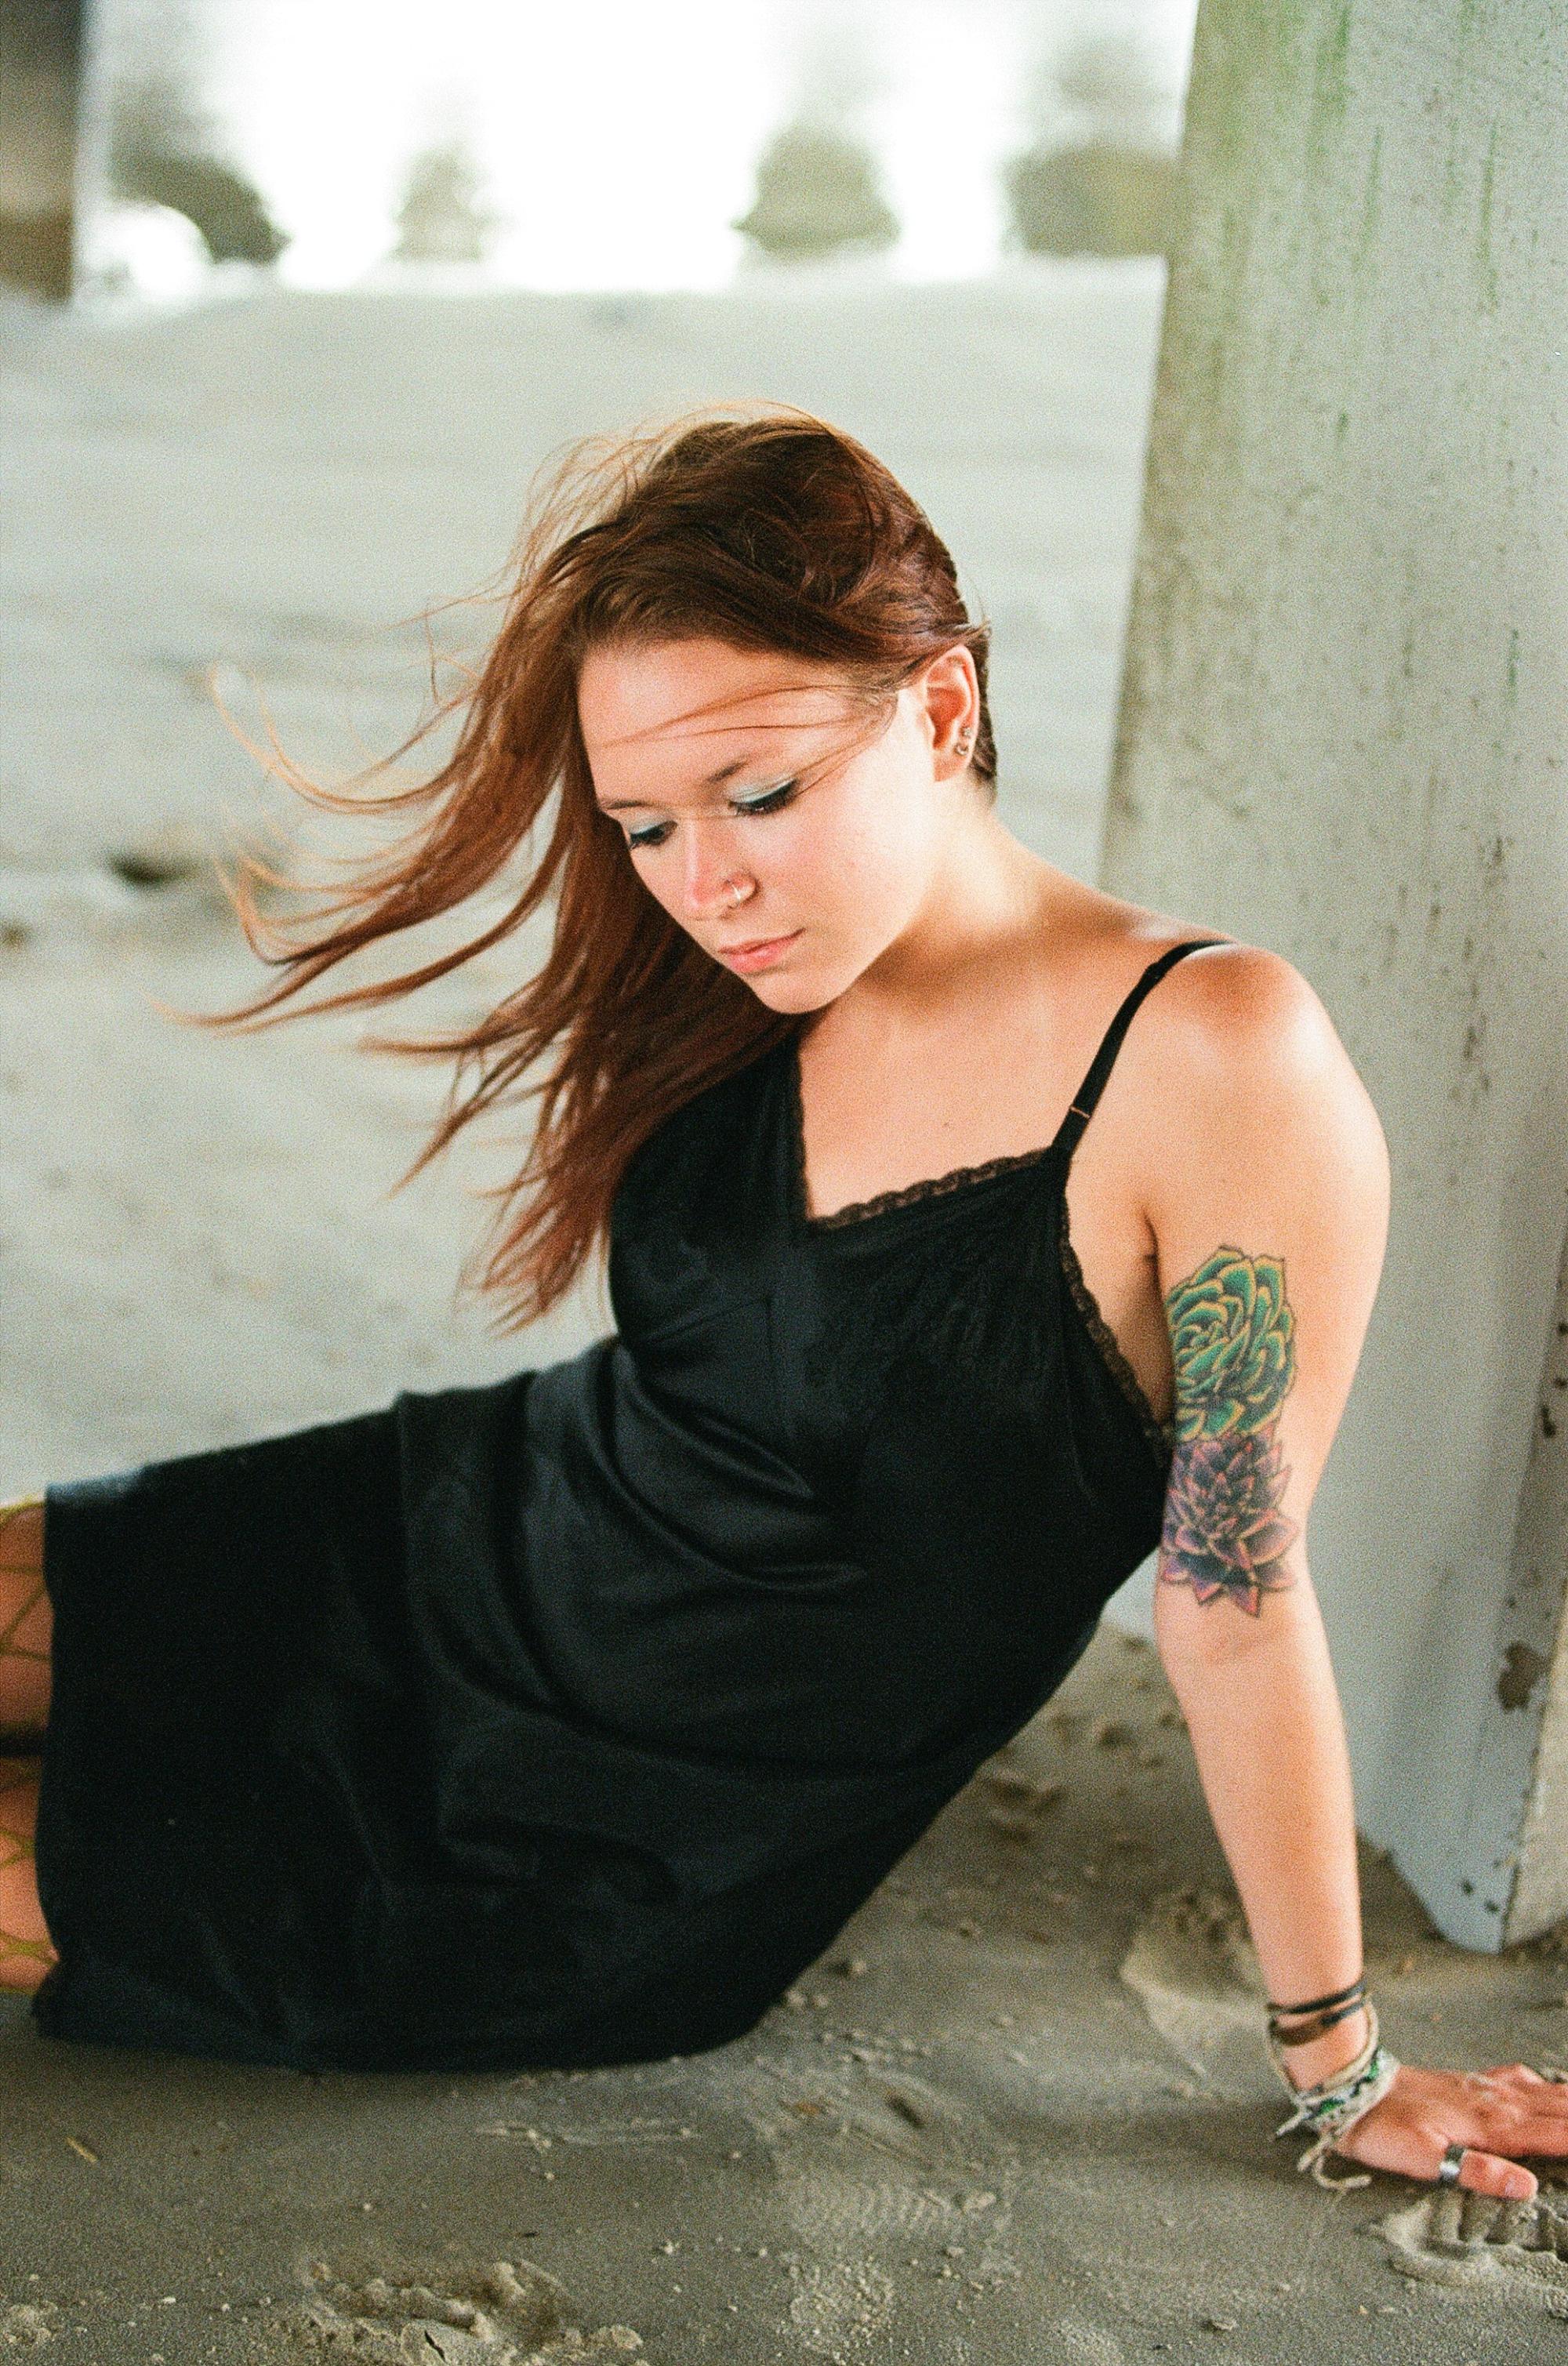 Mermaidens Portrait Series by Holly Cromer, Blacksburg Virginia Creative Portrait Photographer